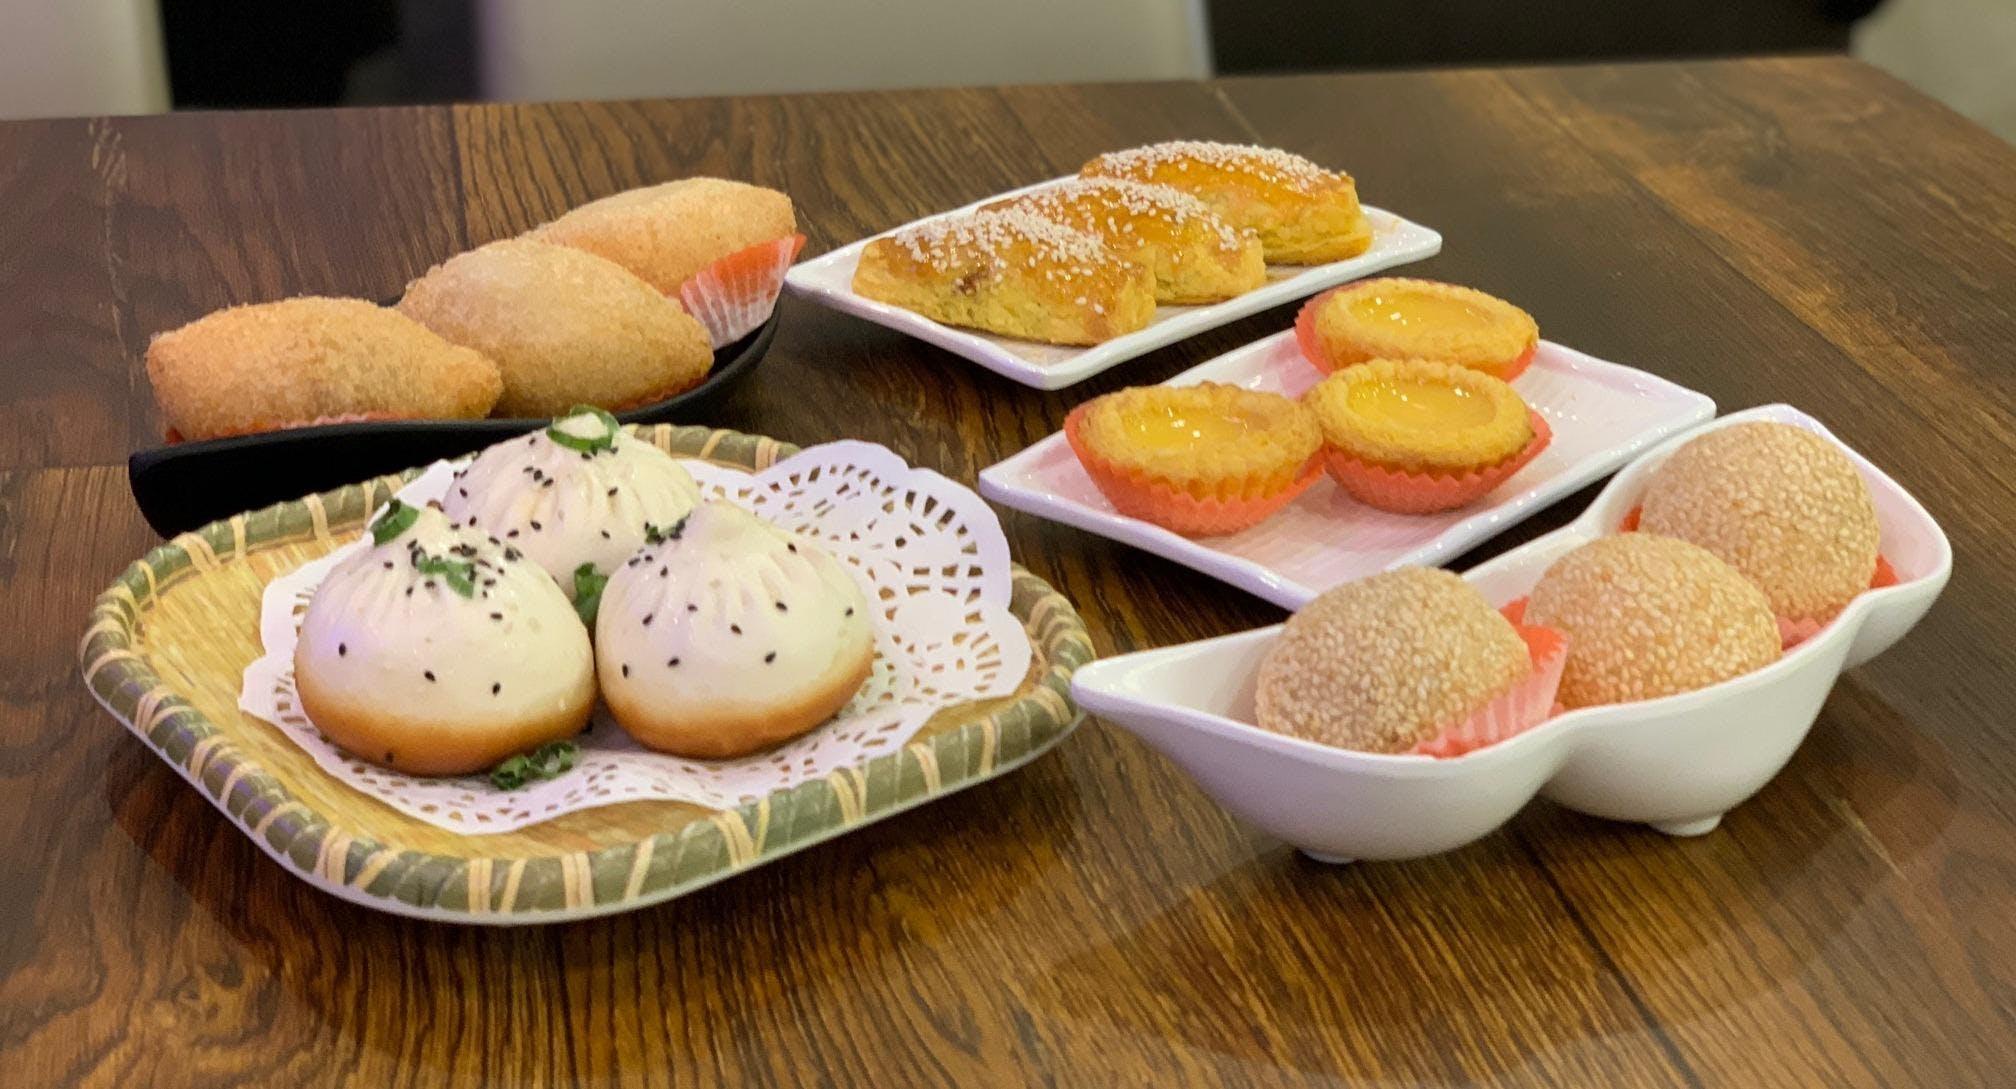 Photo of restaurant Emperor's Kitchen - Cannington in Cannington, Perth